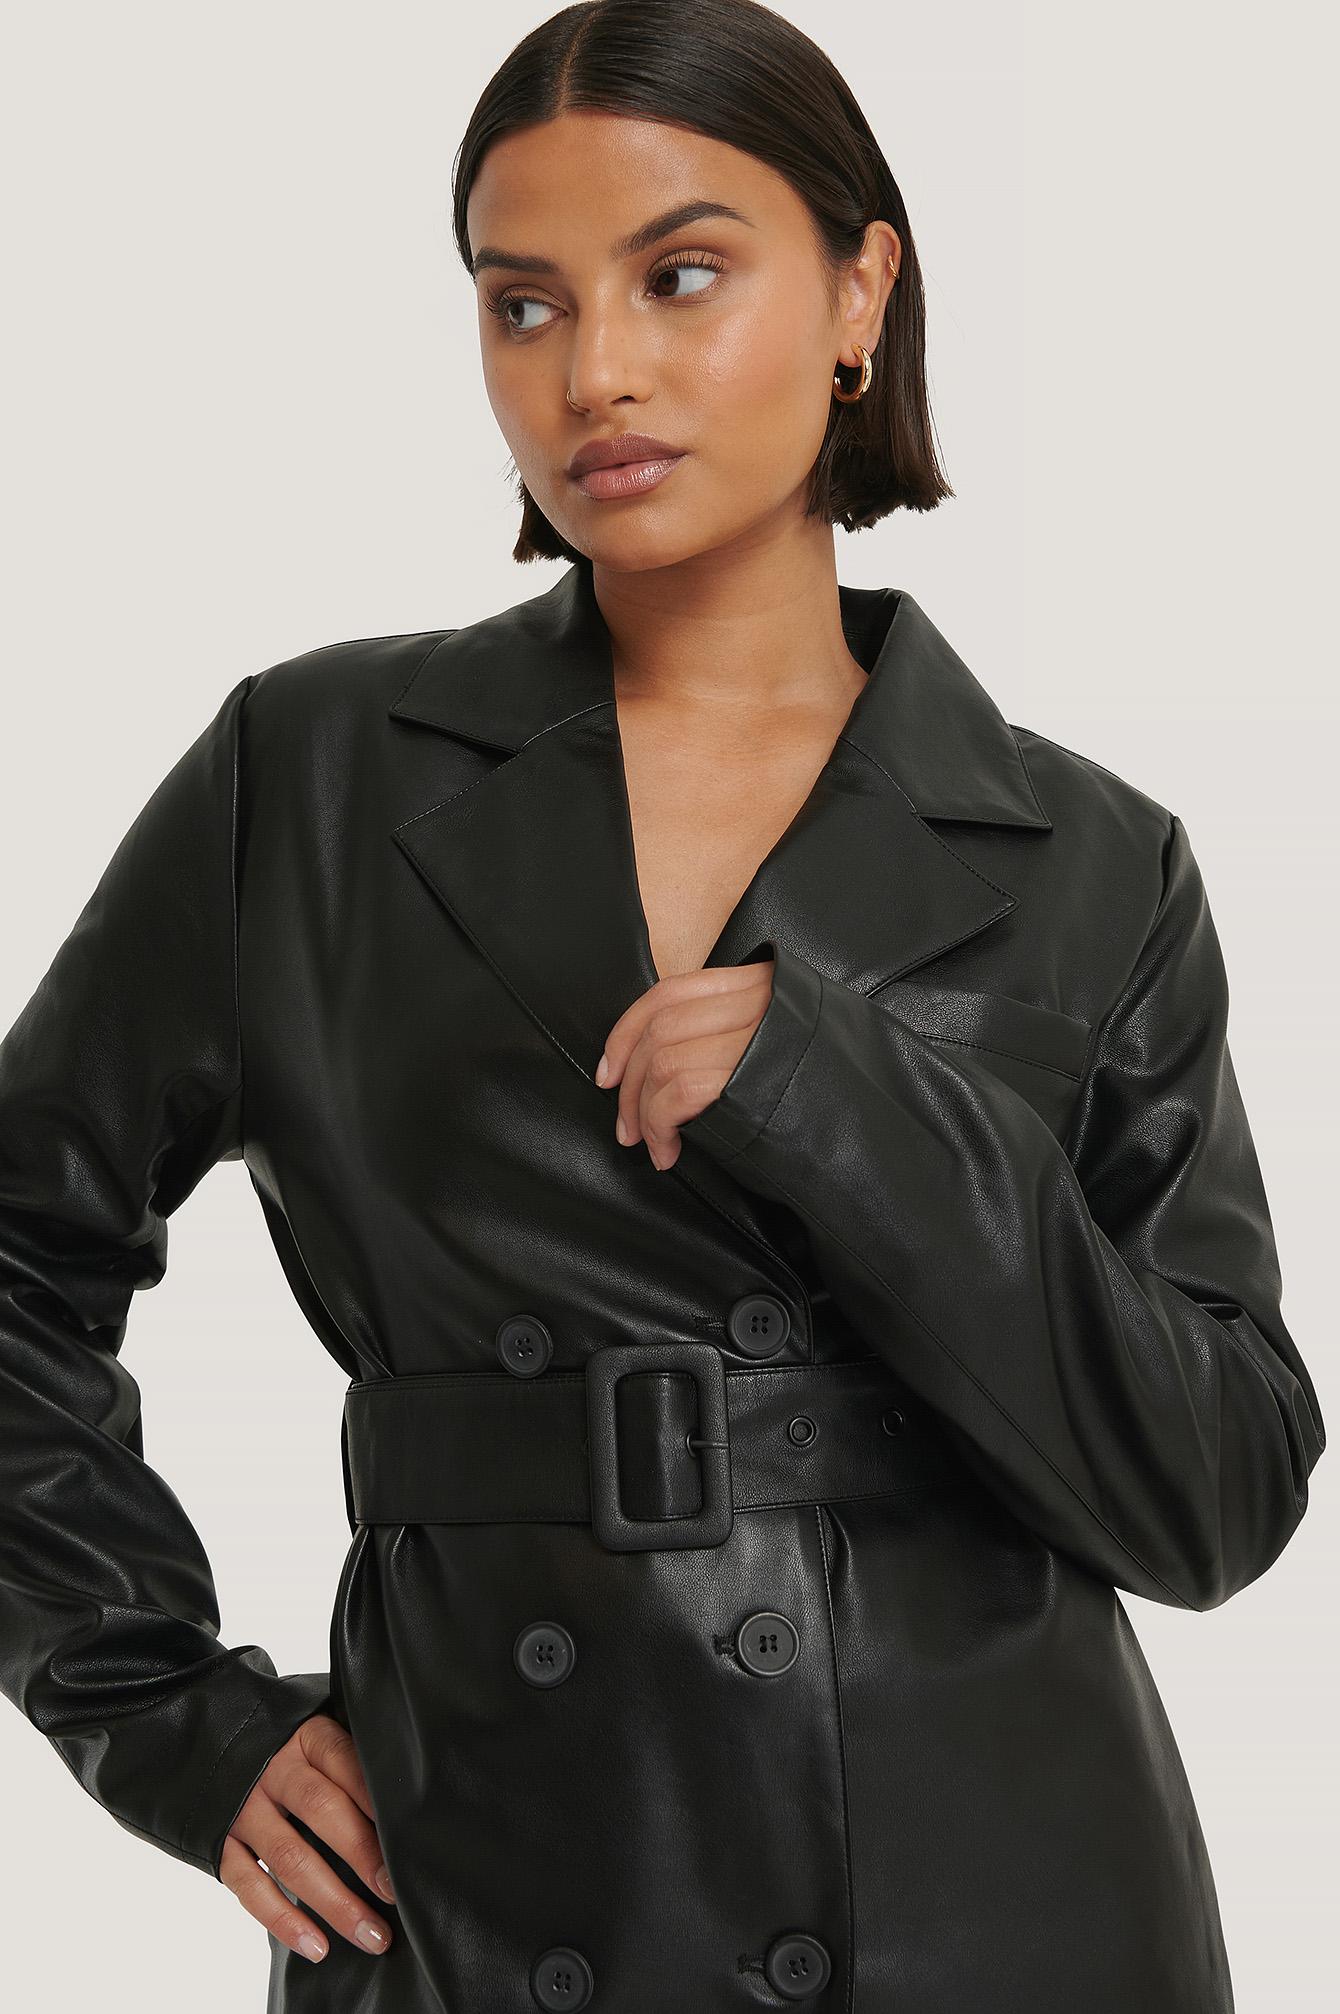 karo kauer x na-kd -  Oversized PU Leather Jacket - Black